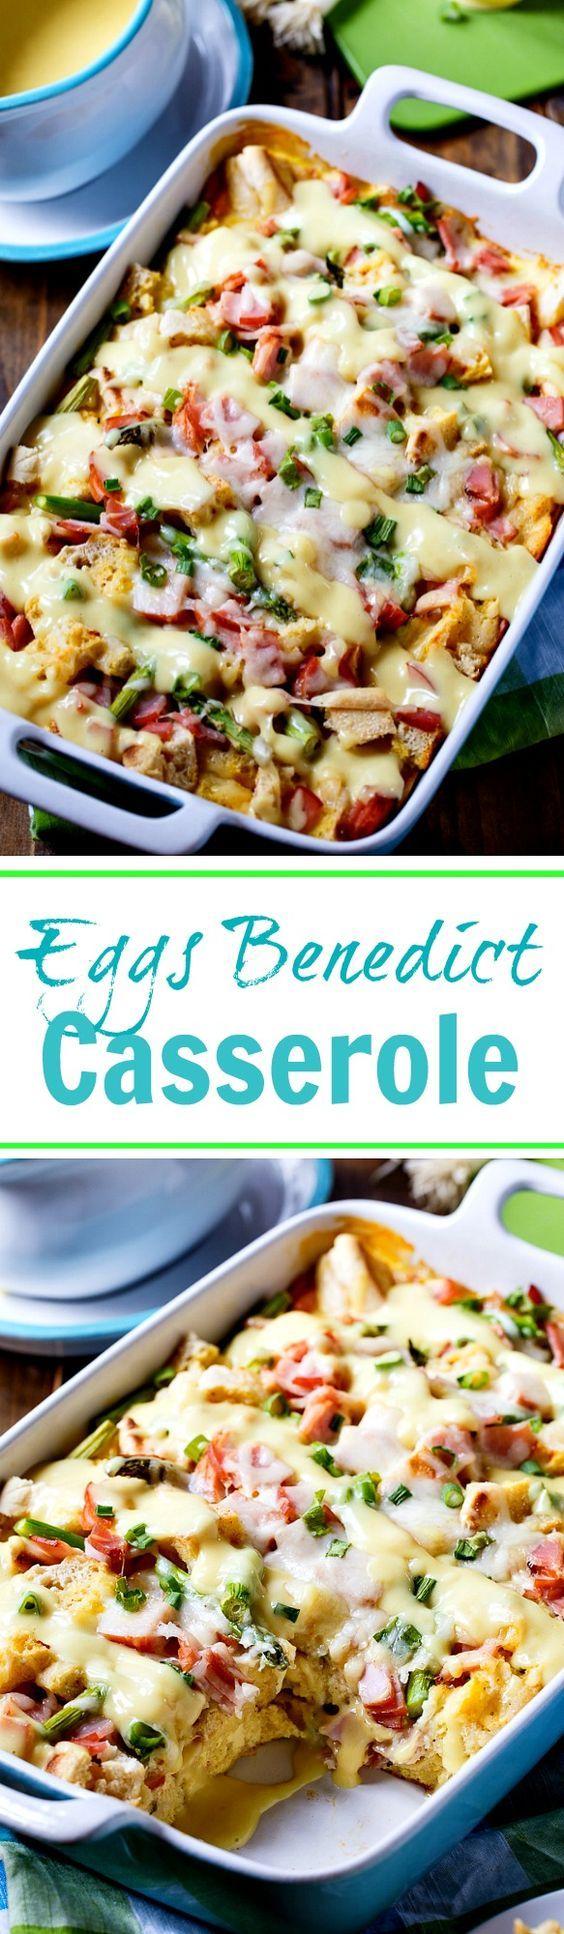 Eggs Benedict Breakfast Casserole Recipe | Spicy Southern Kitchen